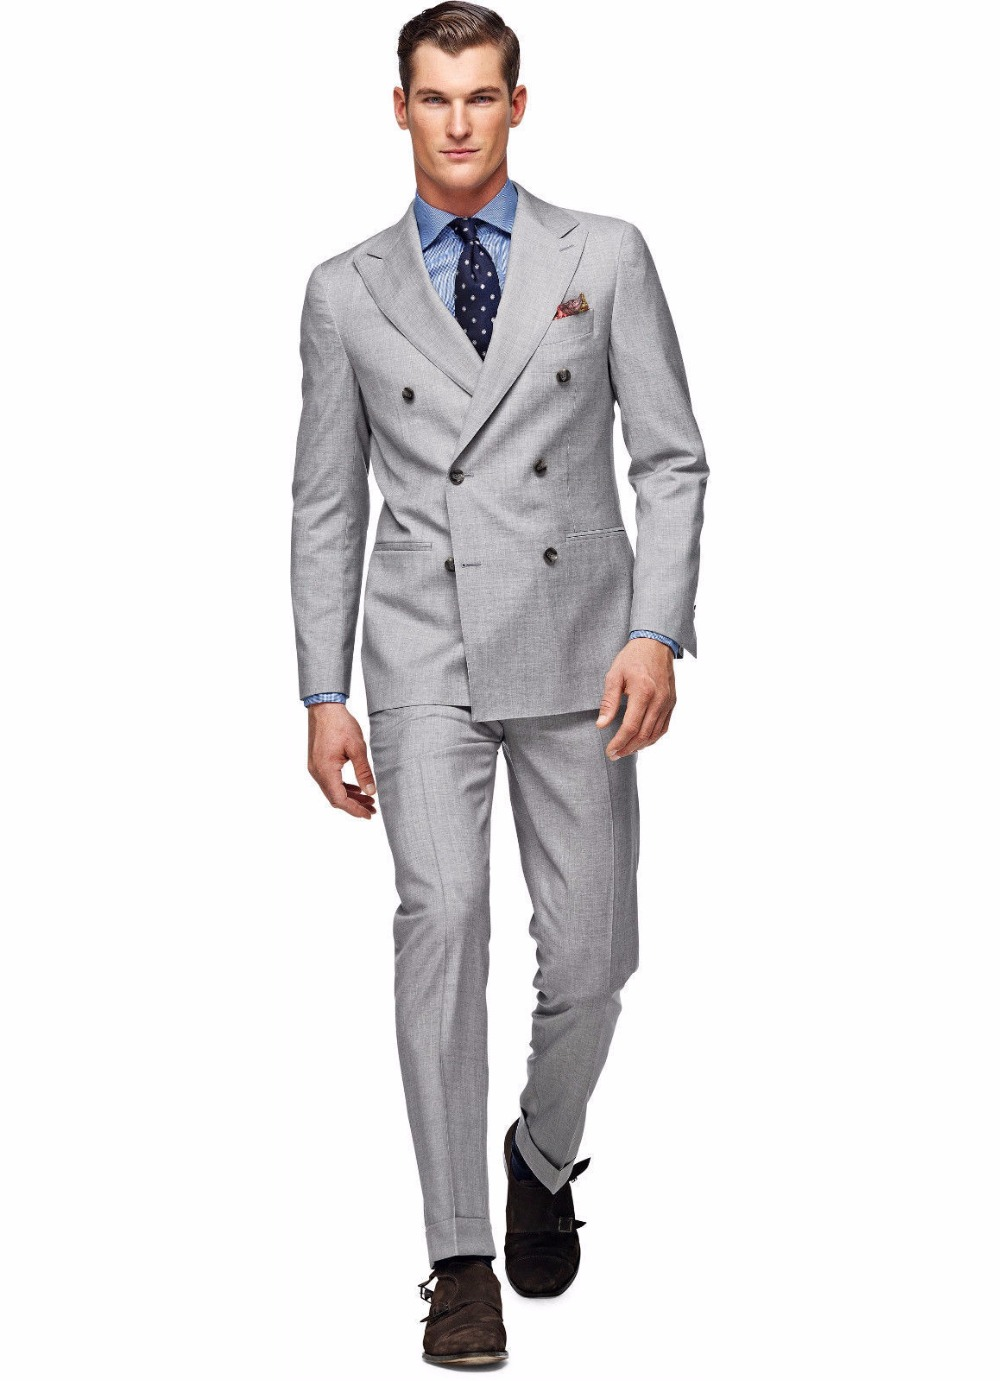 Popular 2 Piece Men Grey Suit-Buy Cheap 2 Piece Men Grey Suit lots